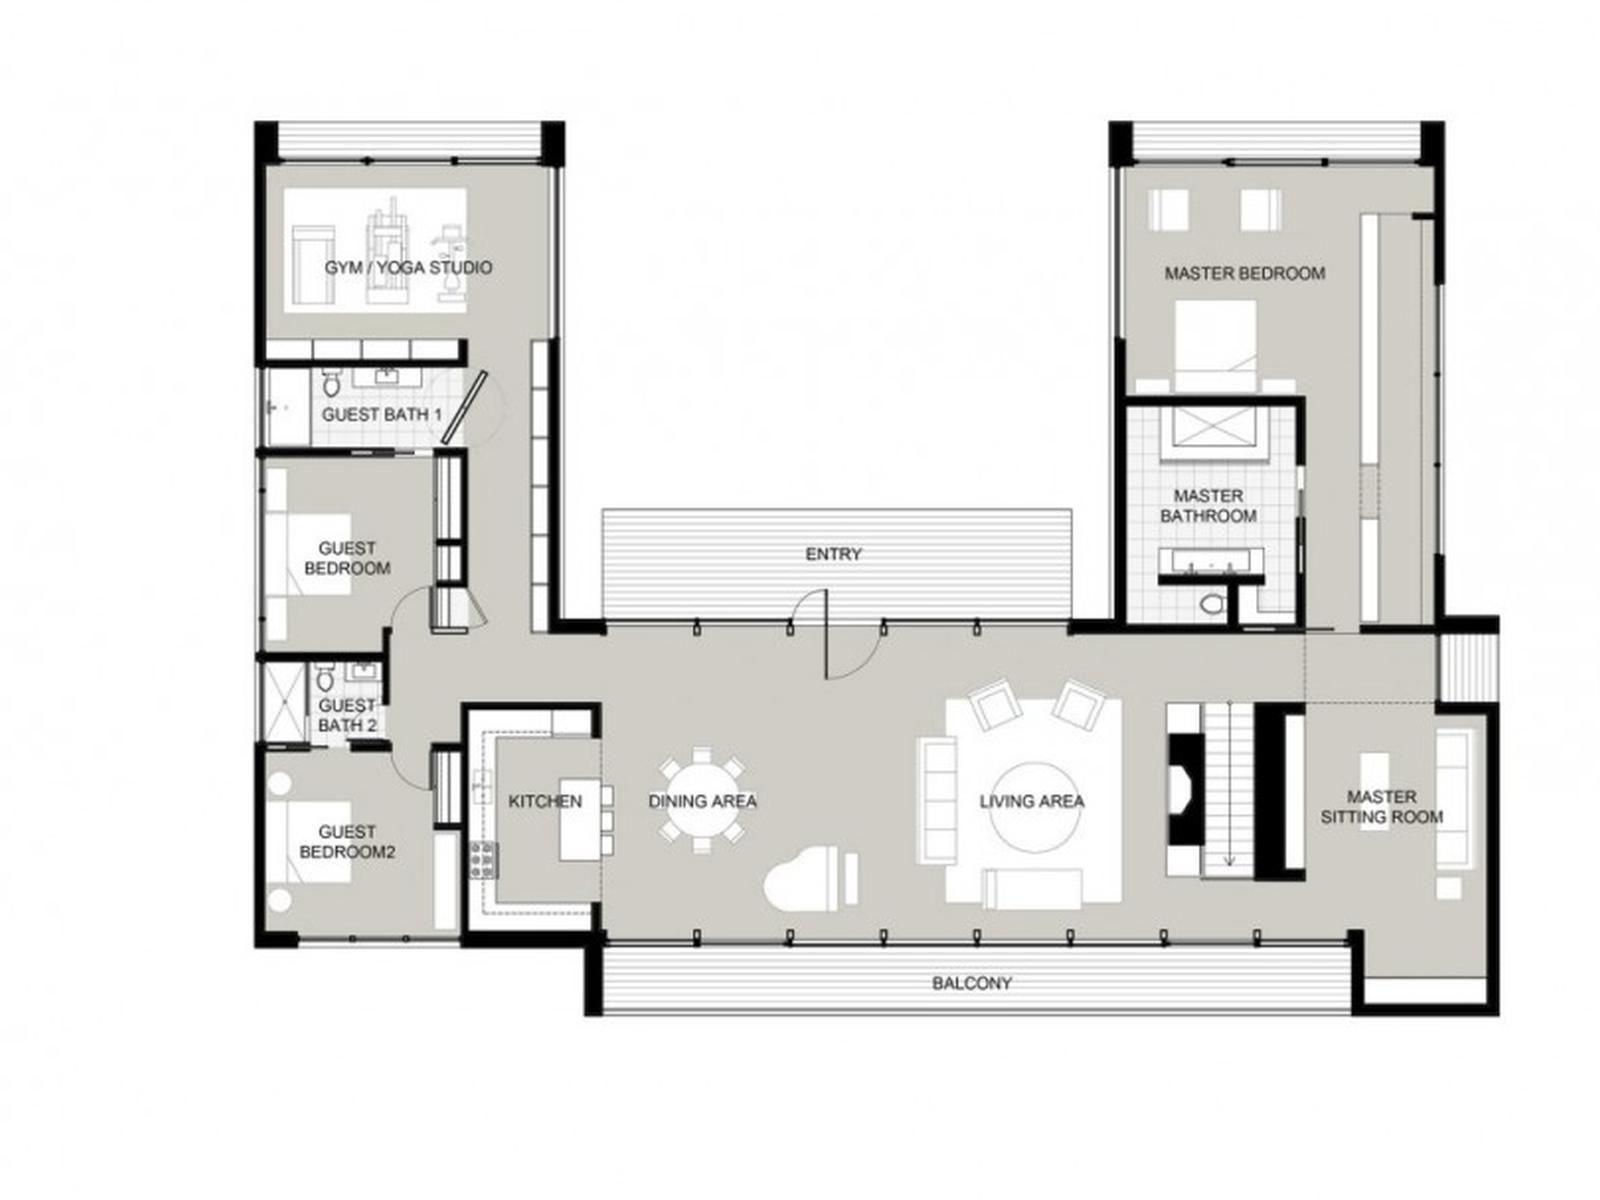 Coolest U Shaped Ranch House Plans 1jk2 Pool House Plans U Shaped House Plans Container House Plans